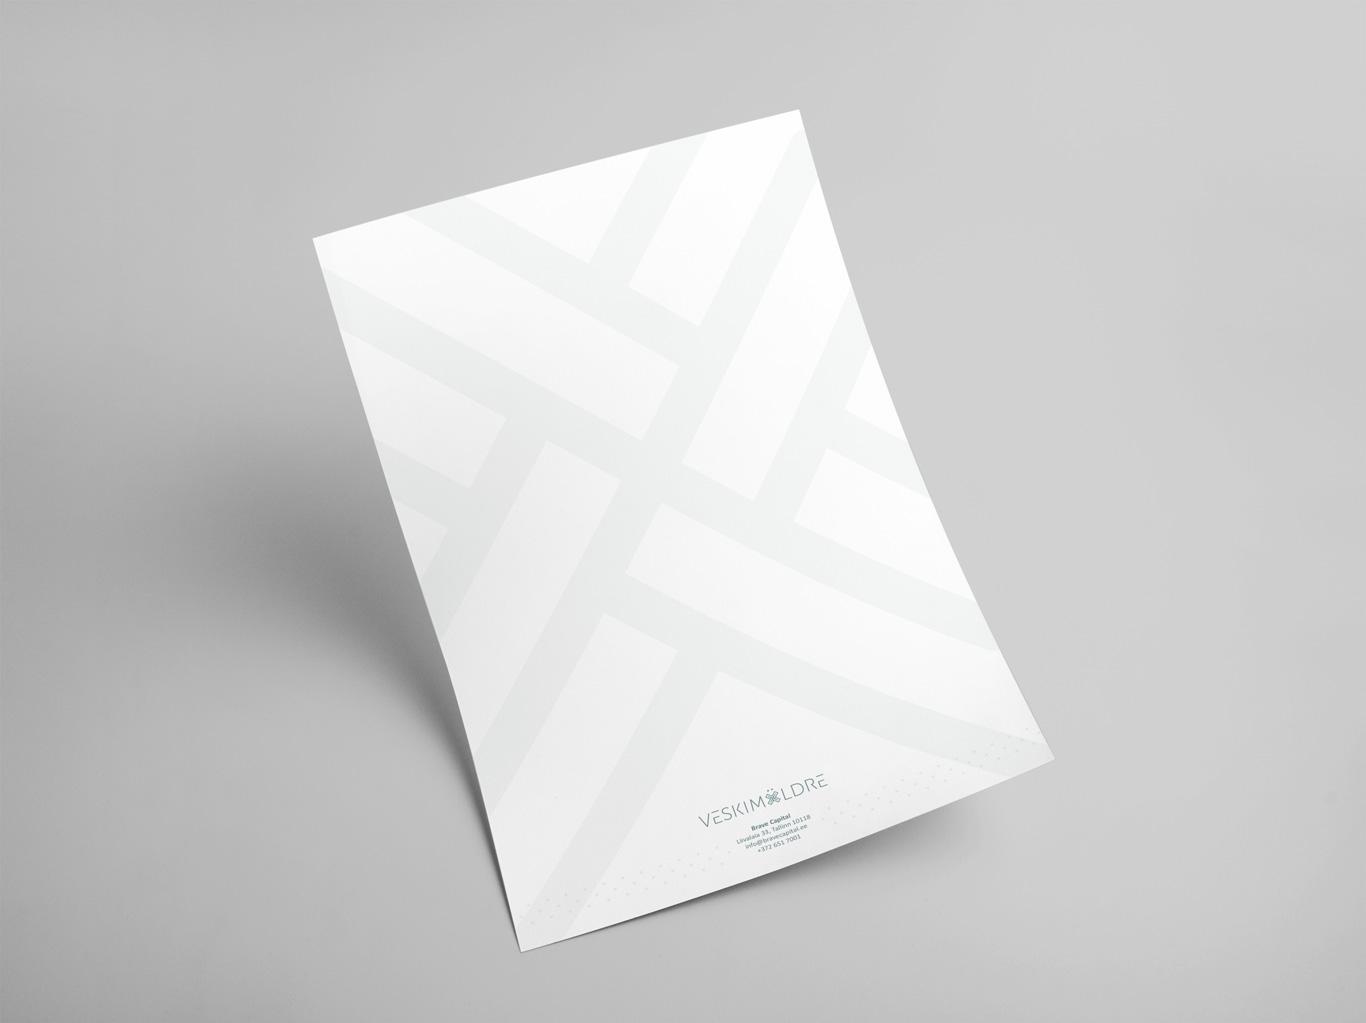 veskimoldre-blank-2